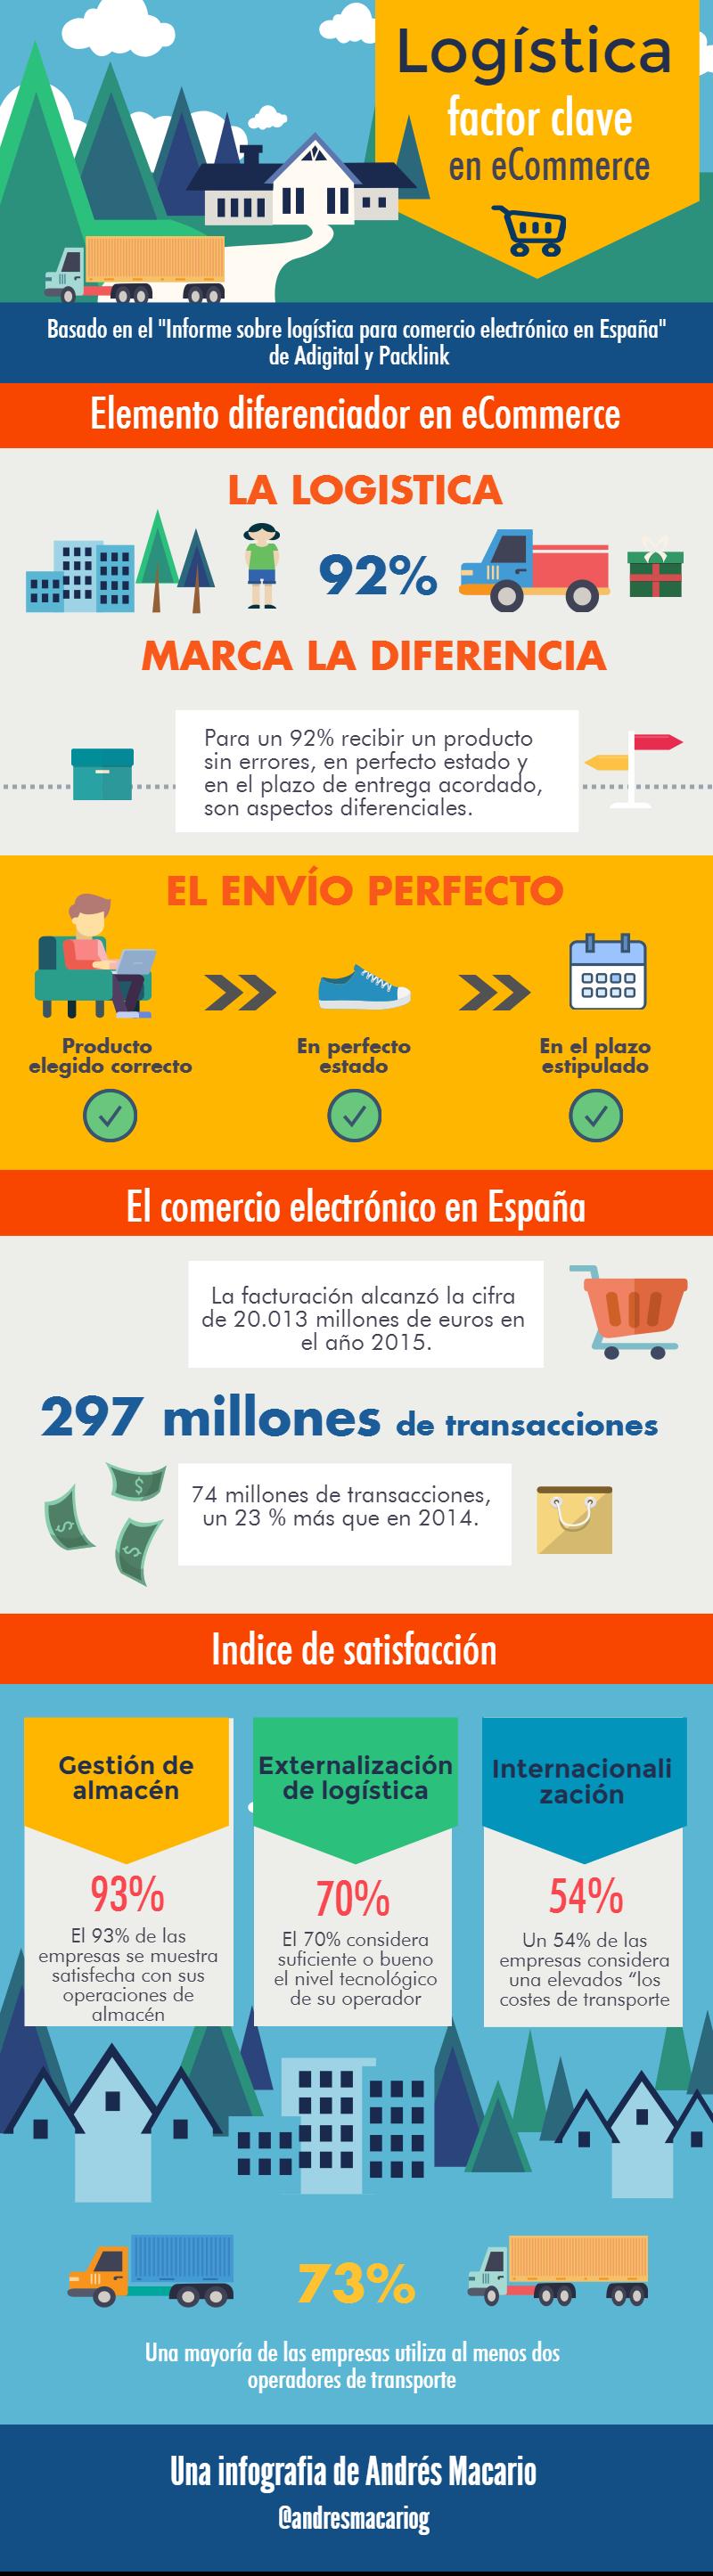 Logistica factor clave en eCommerce Infografia Andres Macario